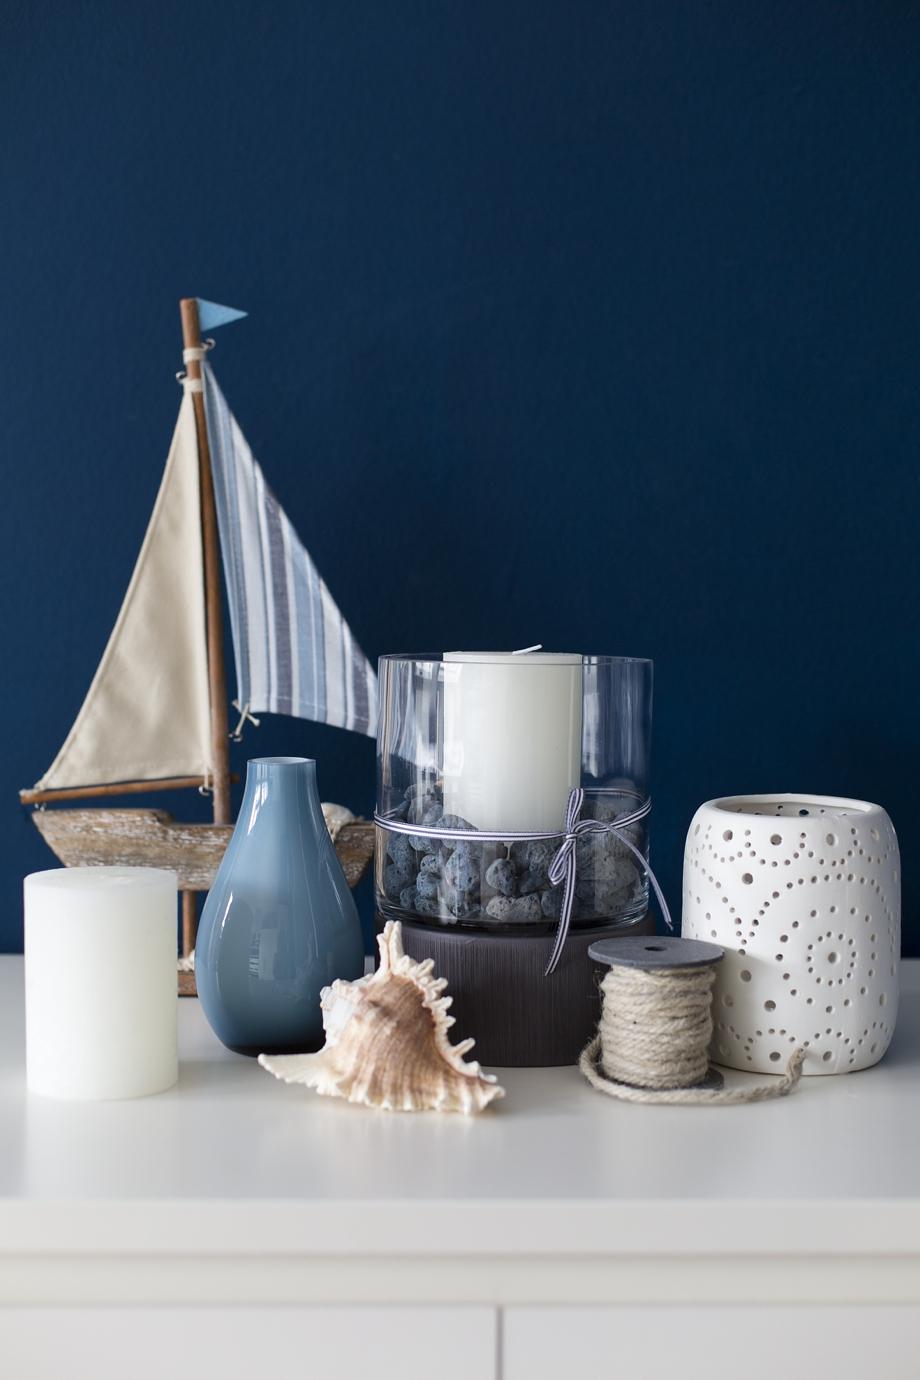 maritime sommerdeko tipps i sch n bei dir blog. Black Bedroom Furniture Sets. Home Design Ideas